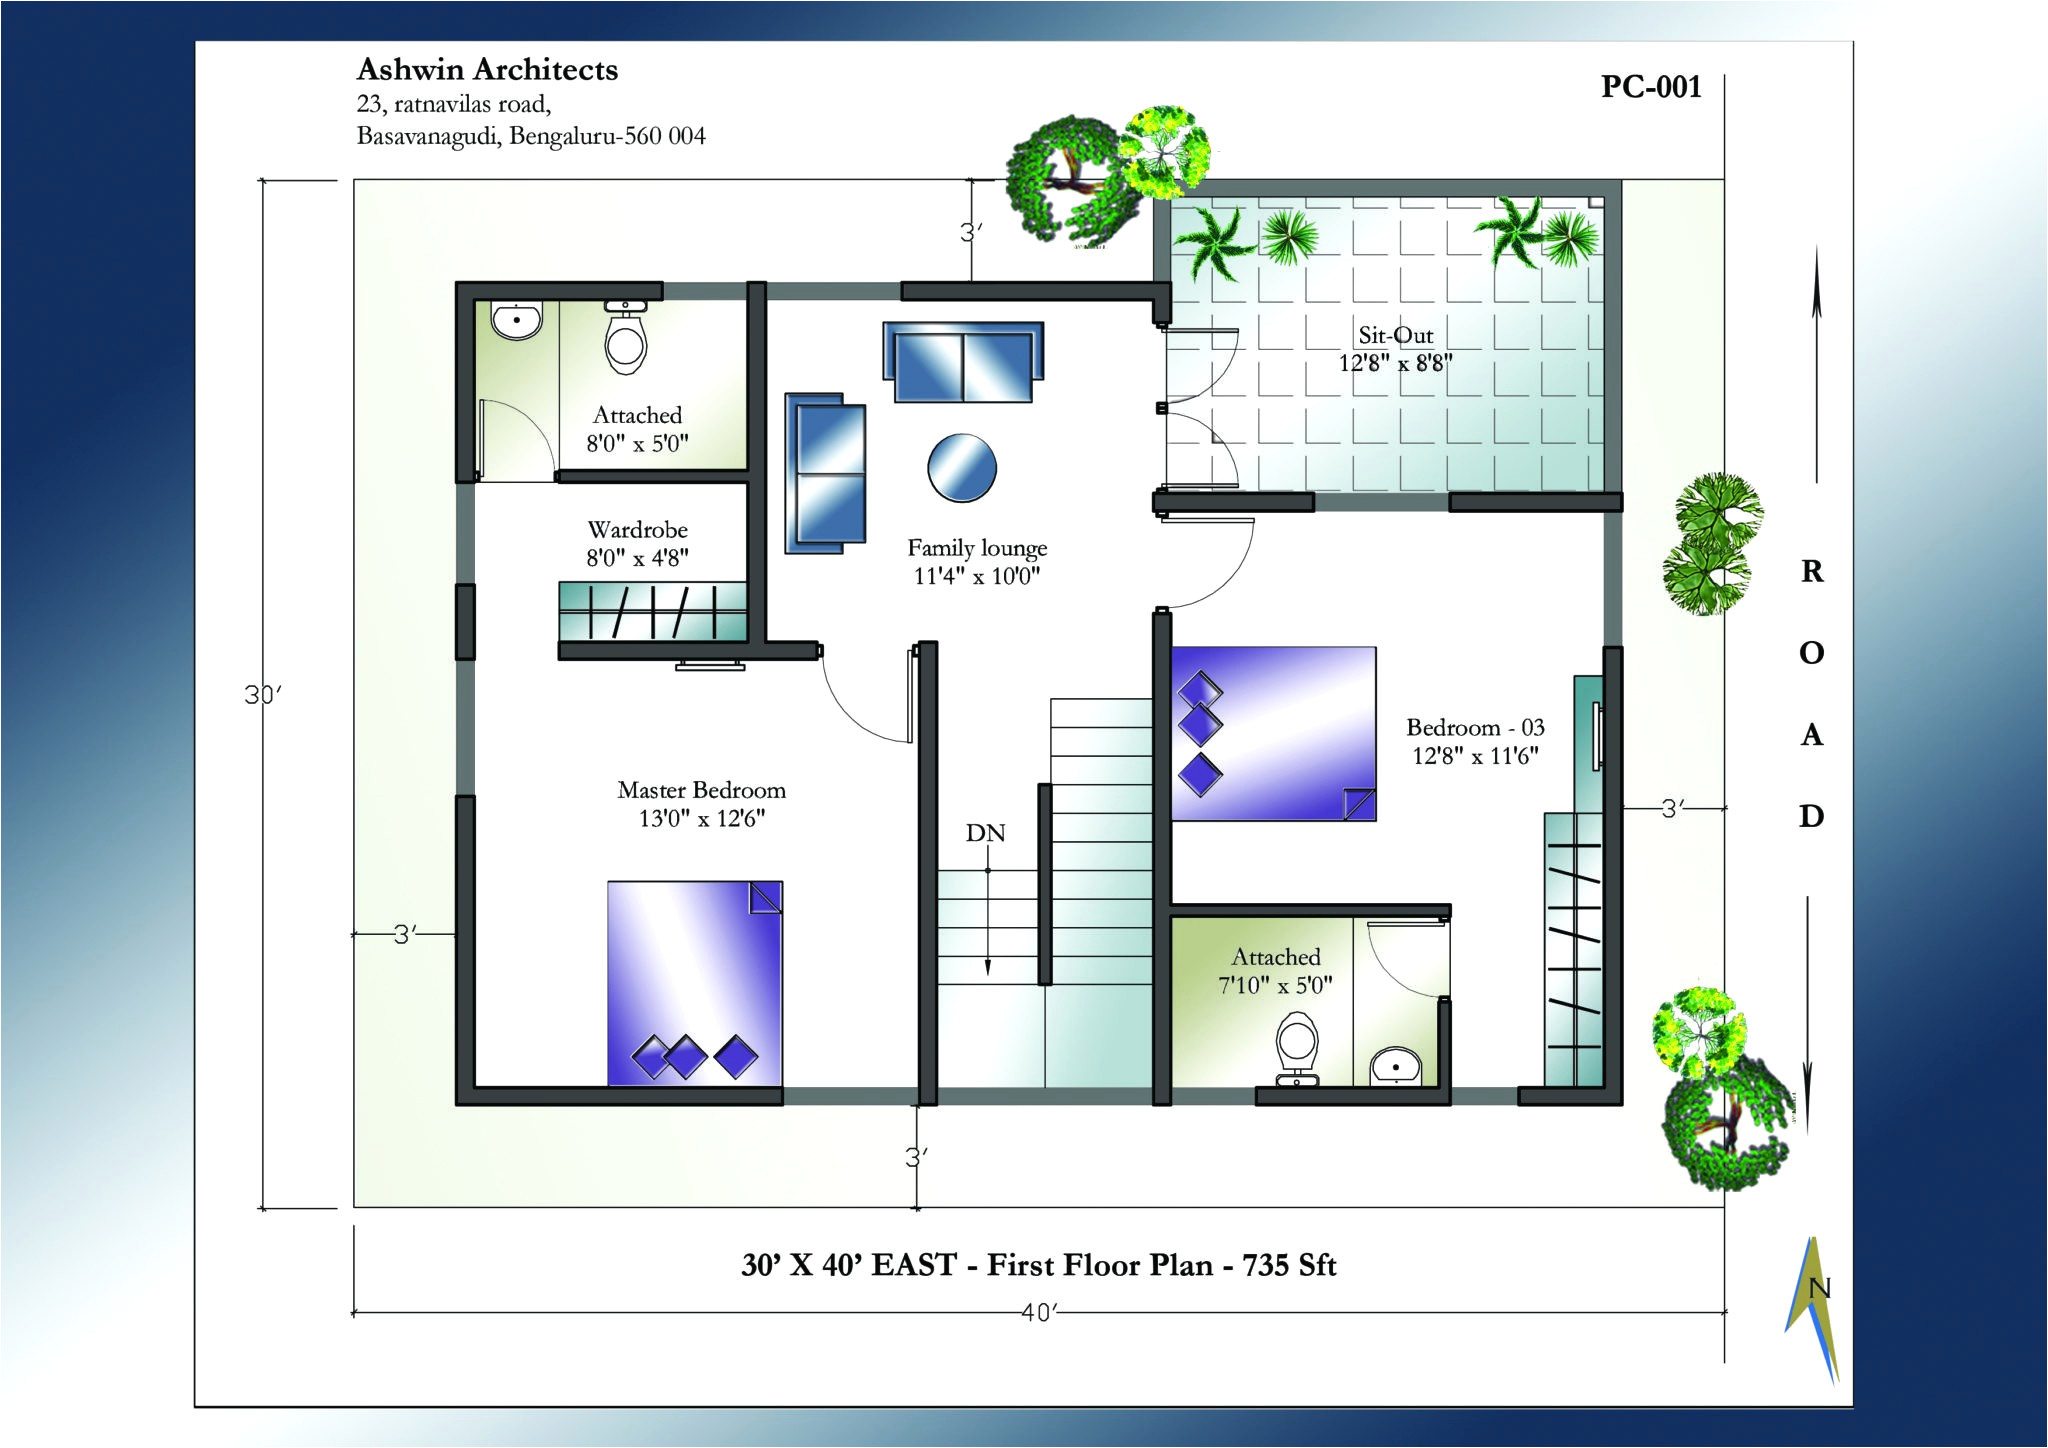 house plan for 20x40 site south facing best of south facing house floor plans lovely 15 elegant vastu based house